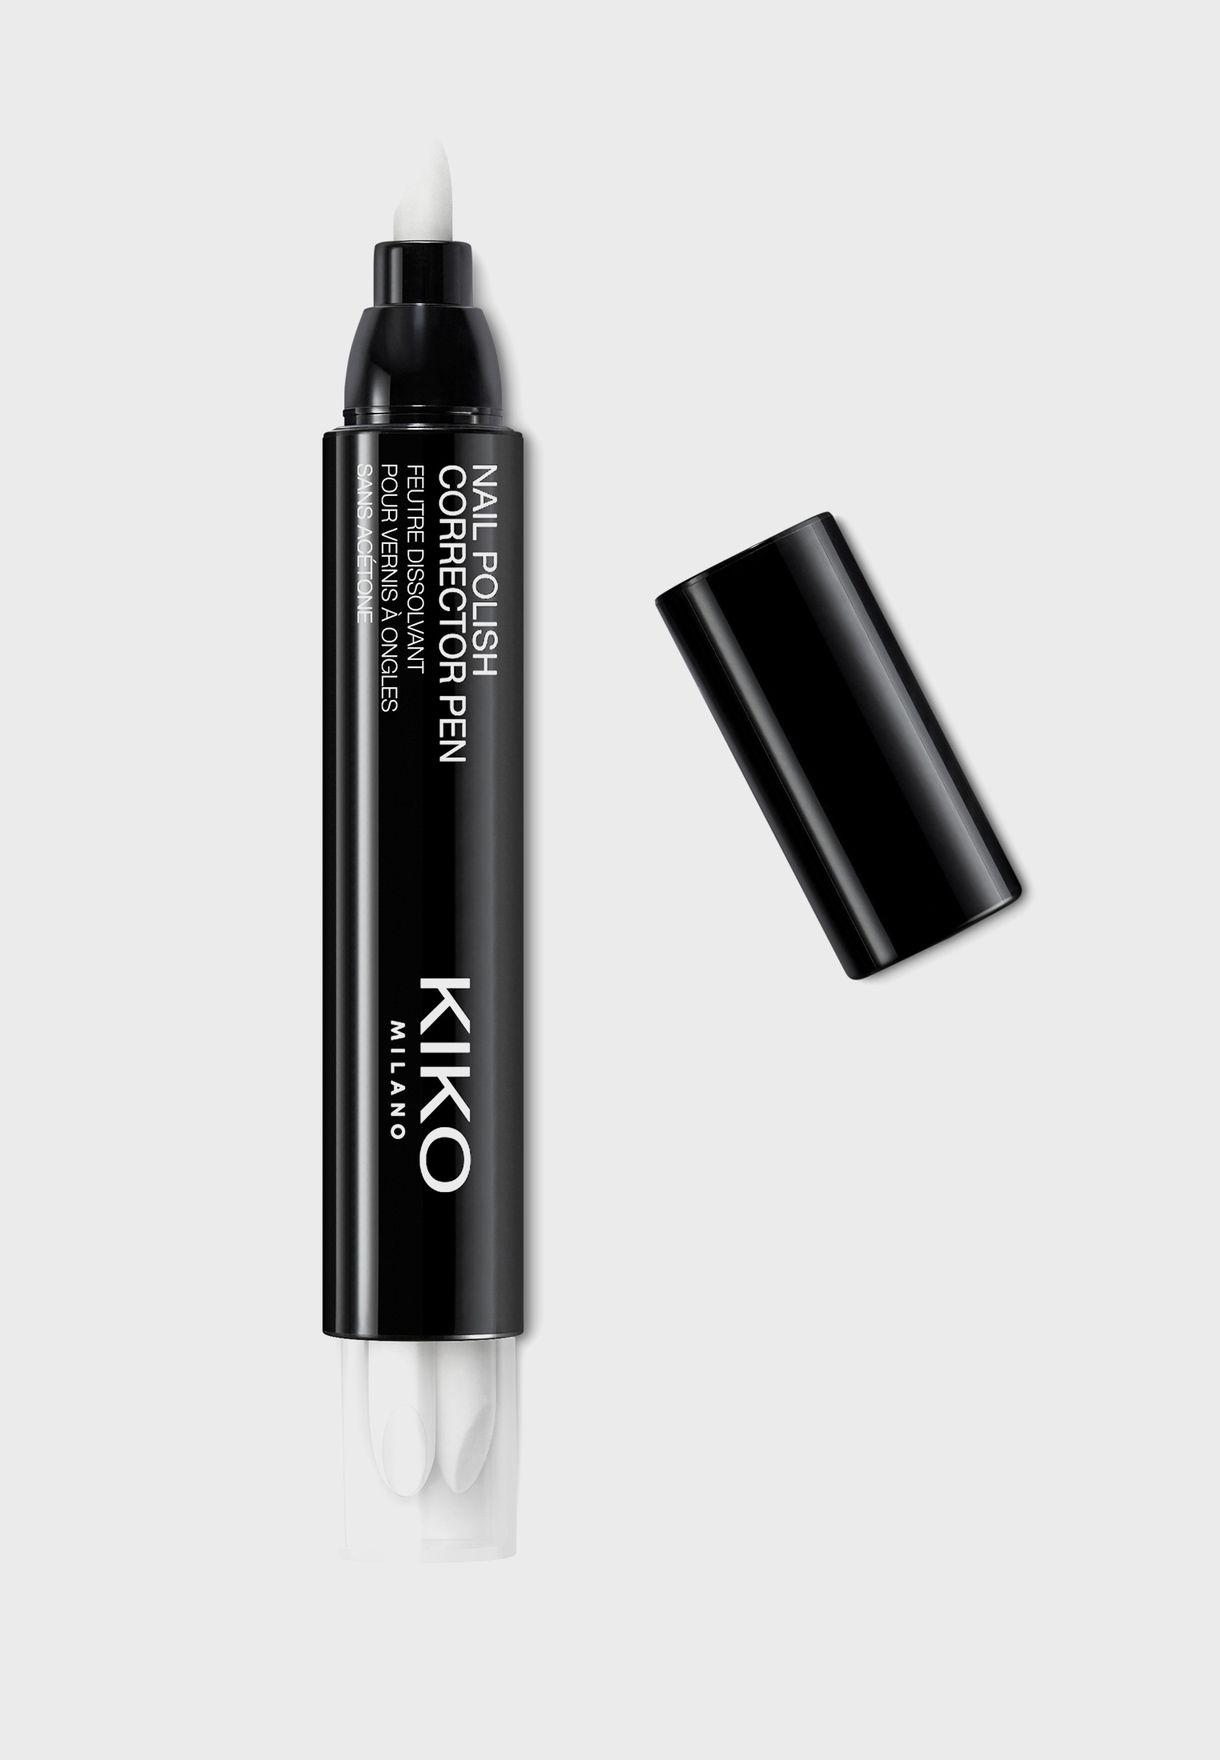 New Nail Polish Corrector Pen